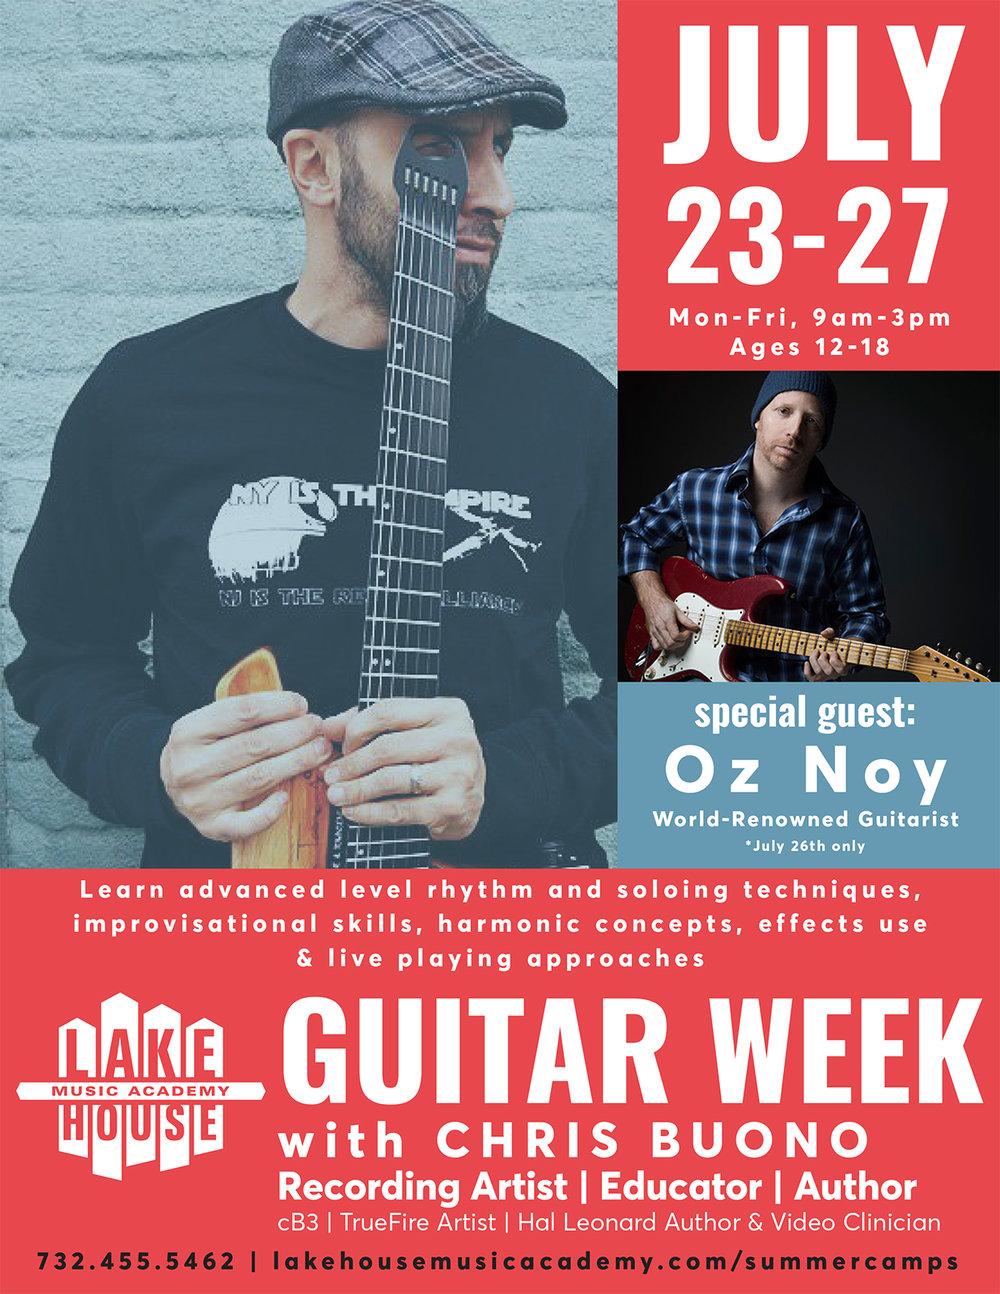 guitarweek_promo_buono_final.jpg